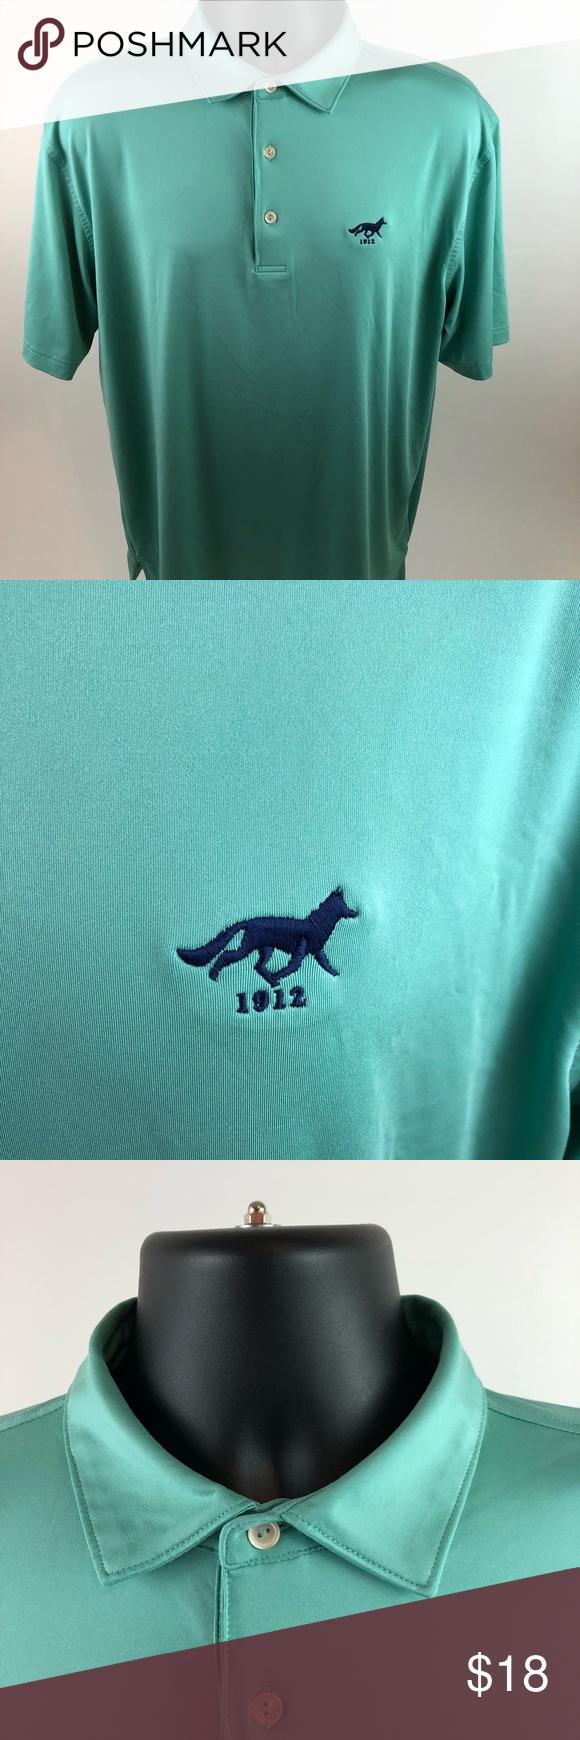 Peter Millar Teal polo w/fox logo men's L. D102 Brand